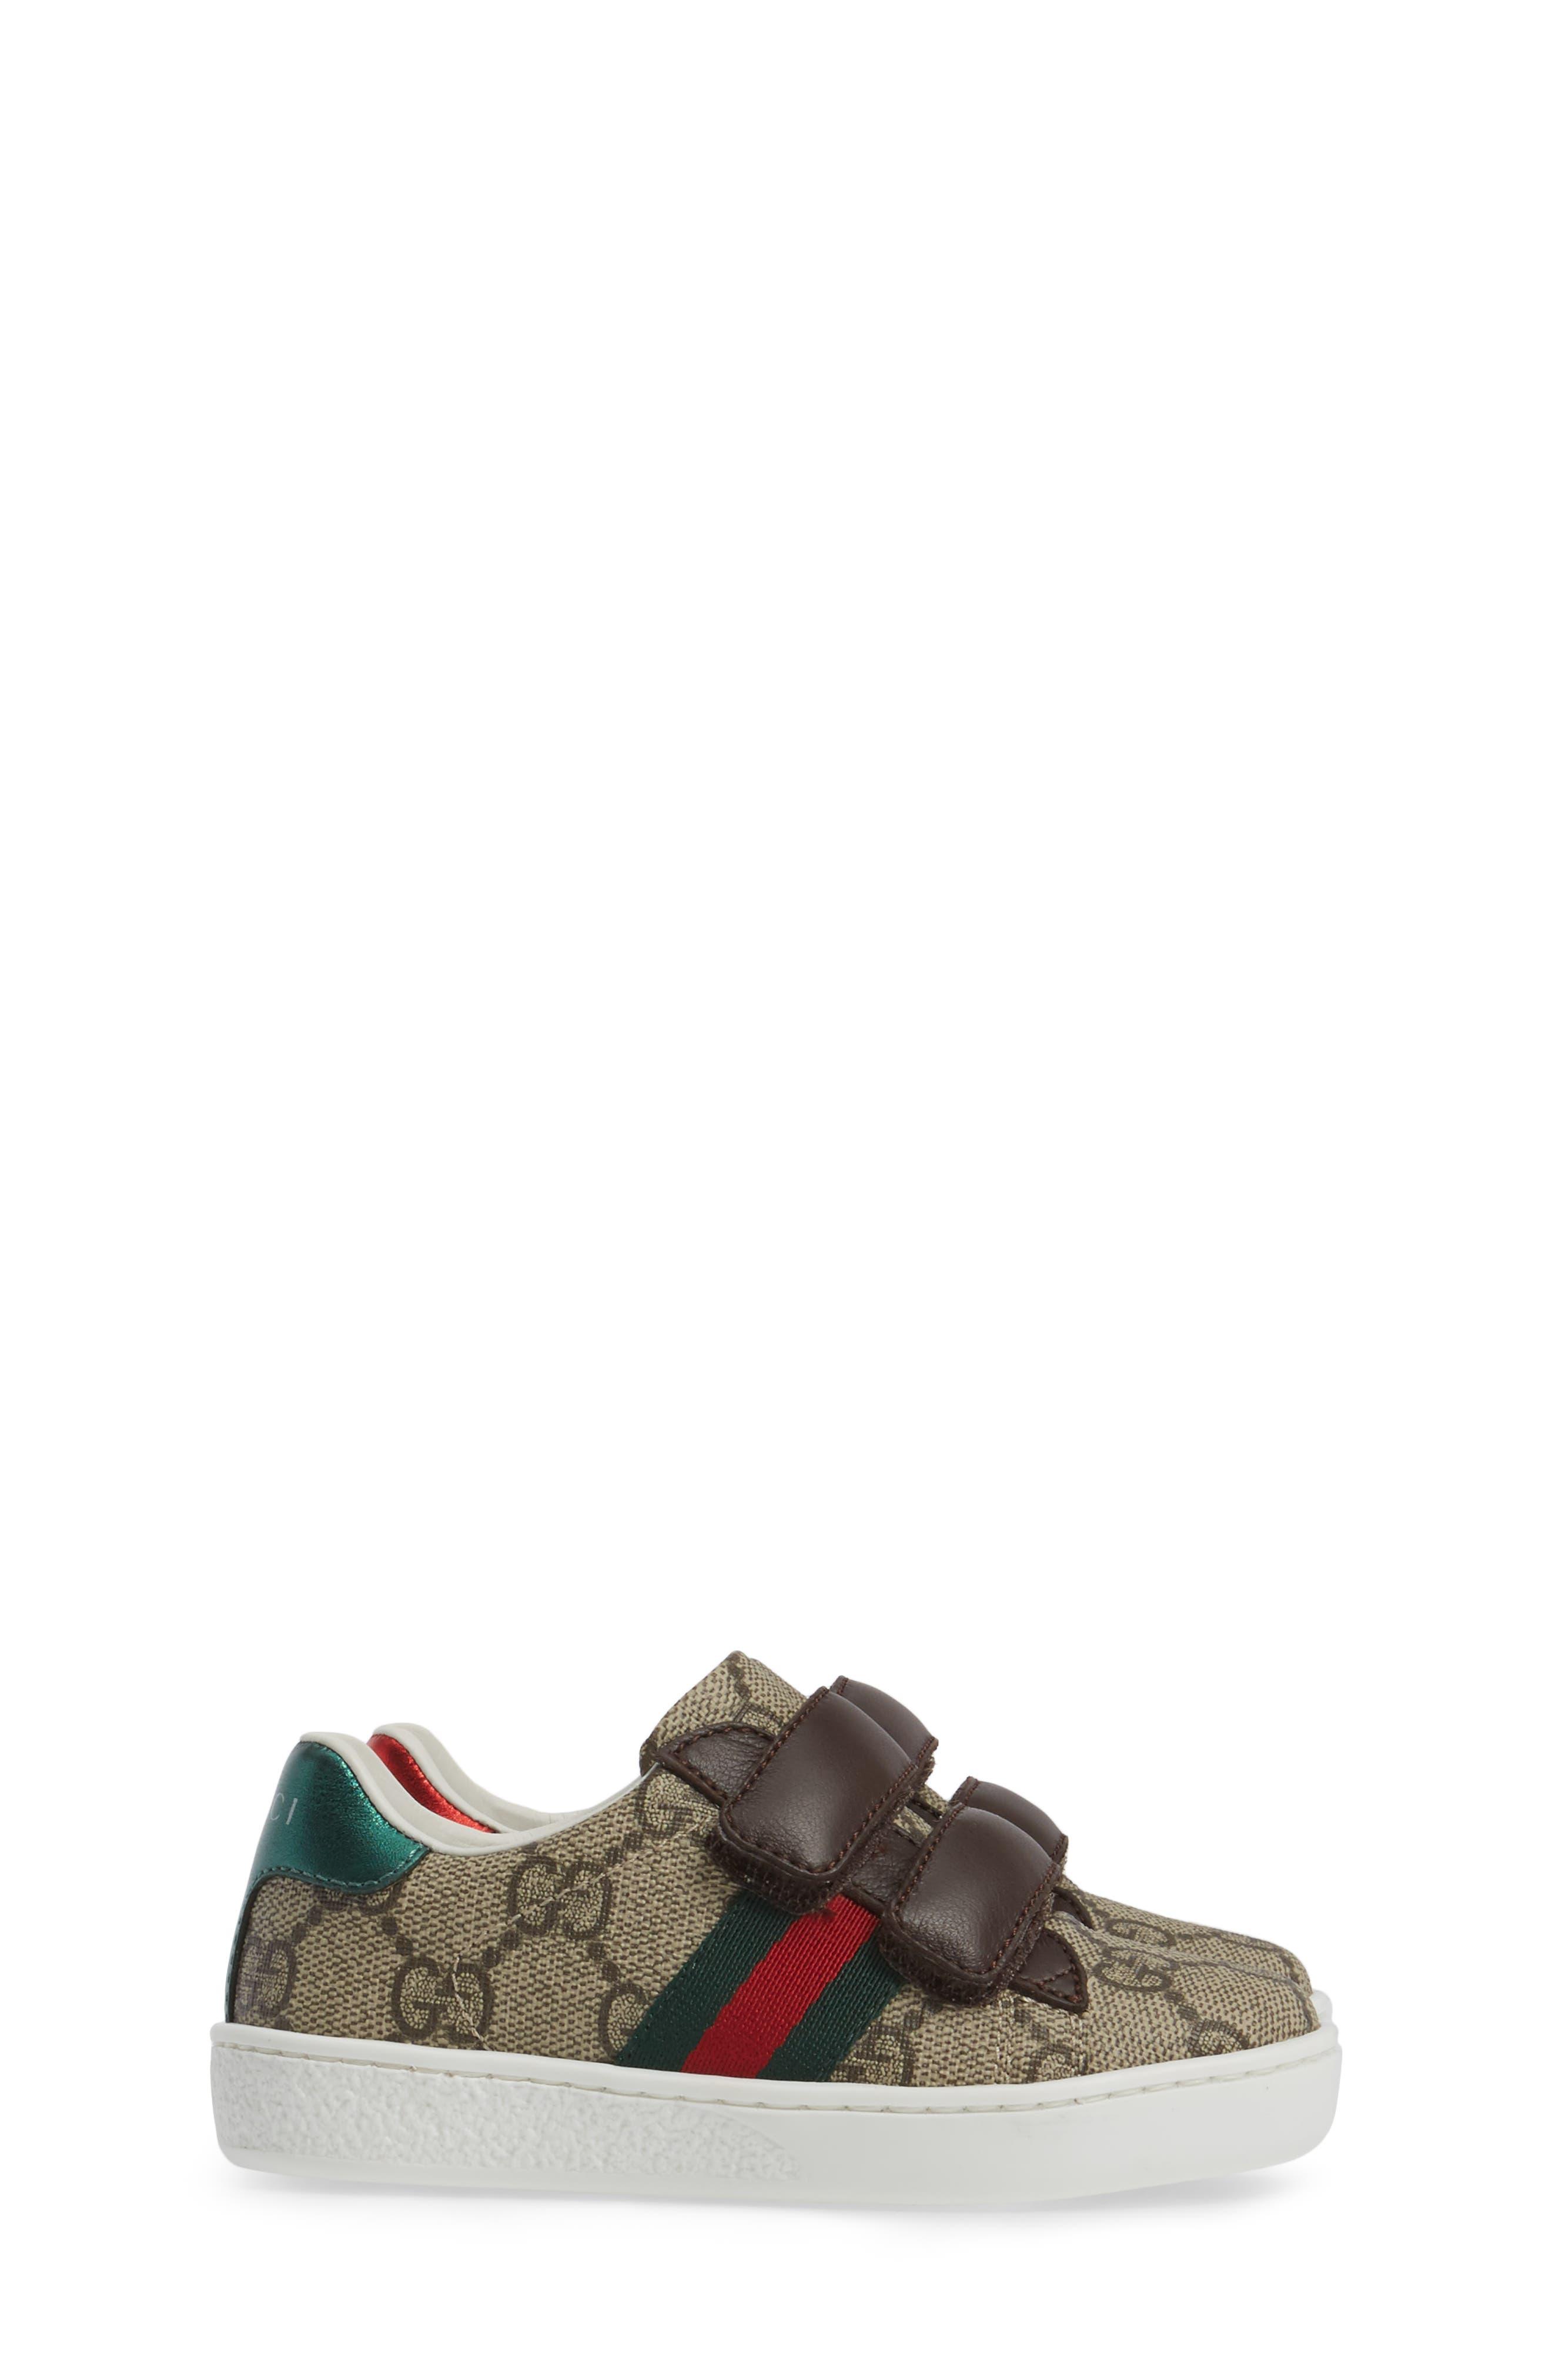 Alternate Image 4  - Gucci New Ace Monogram Sneaker (Baby, Walker, Toddler, Little Kid & Big Kid)